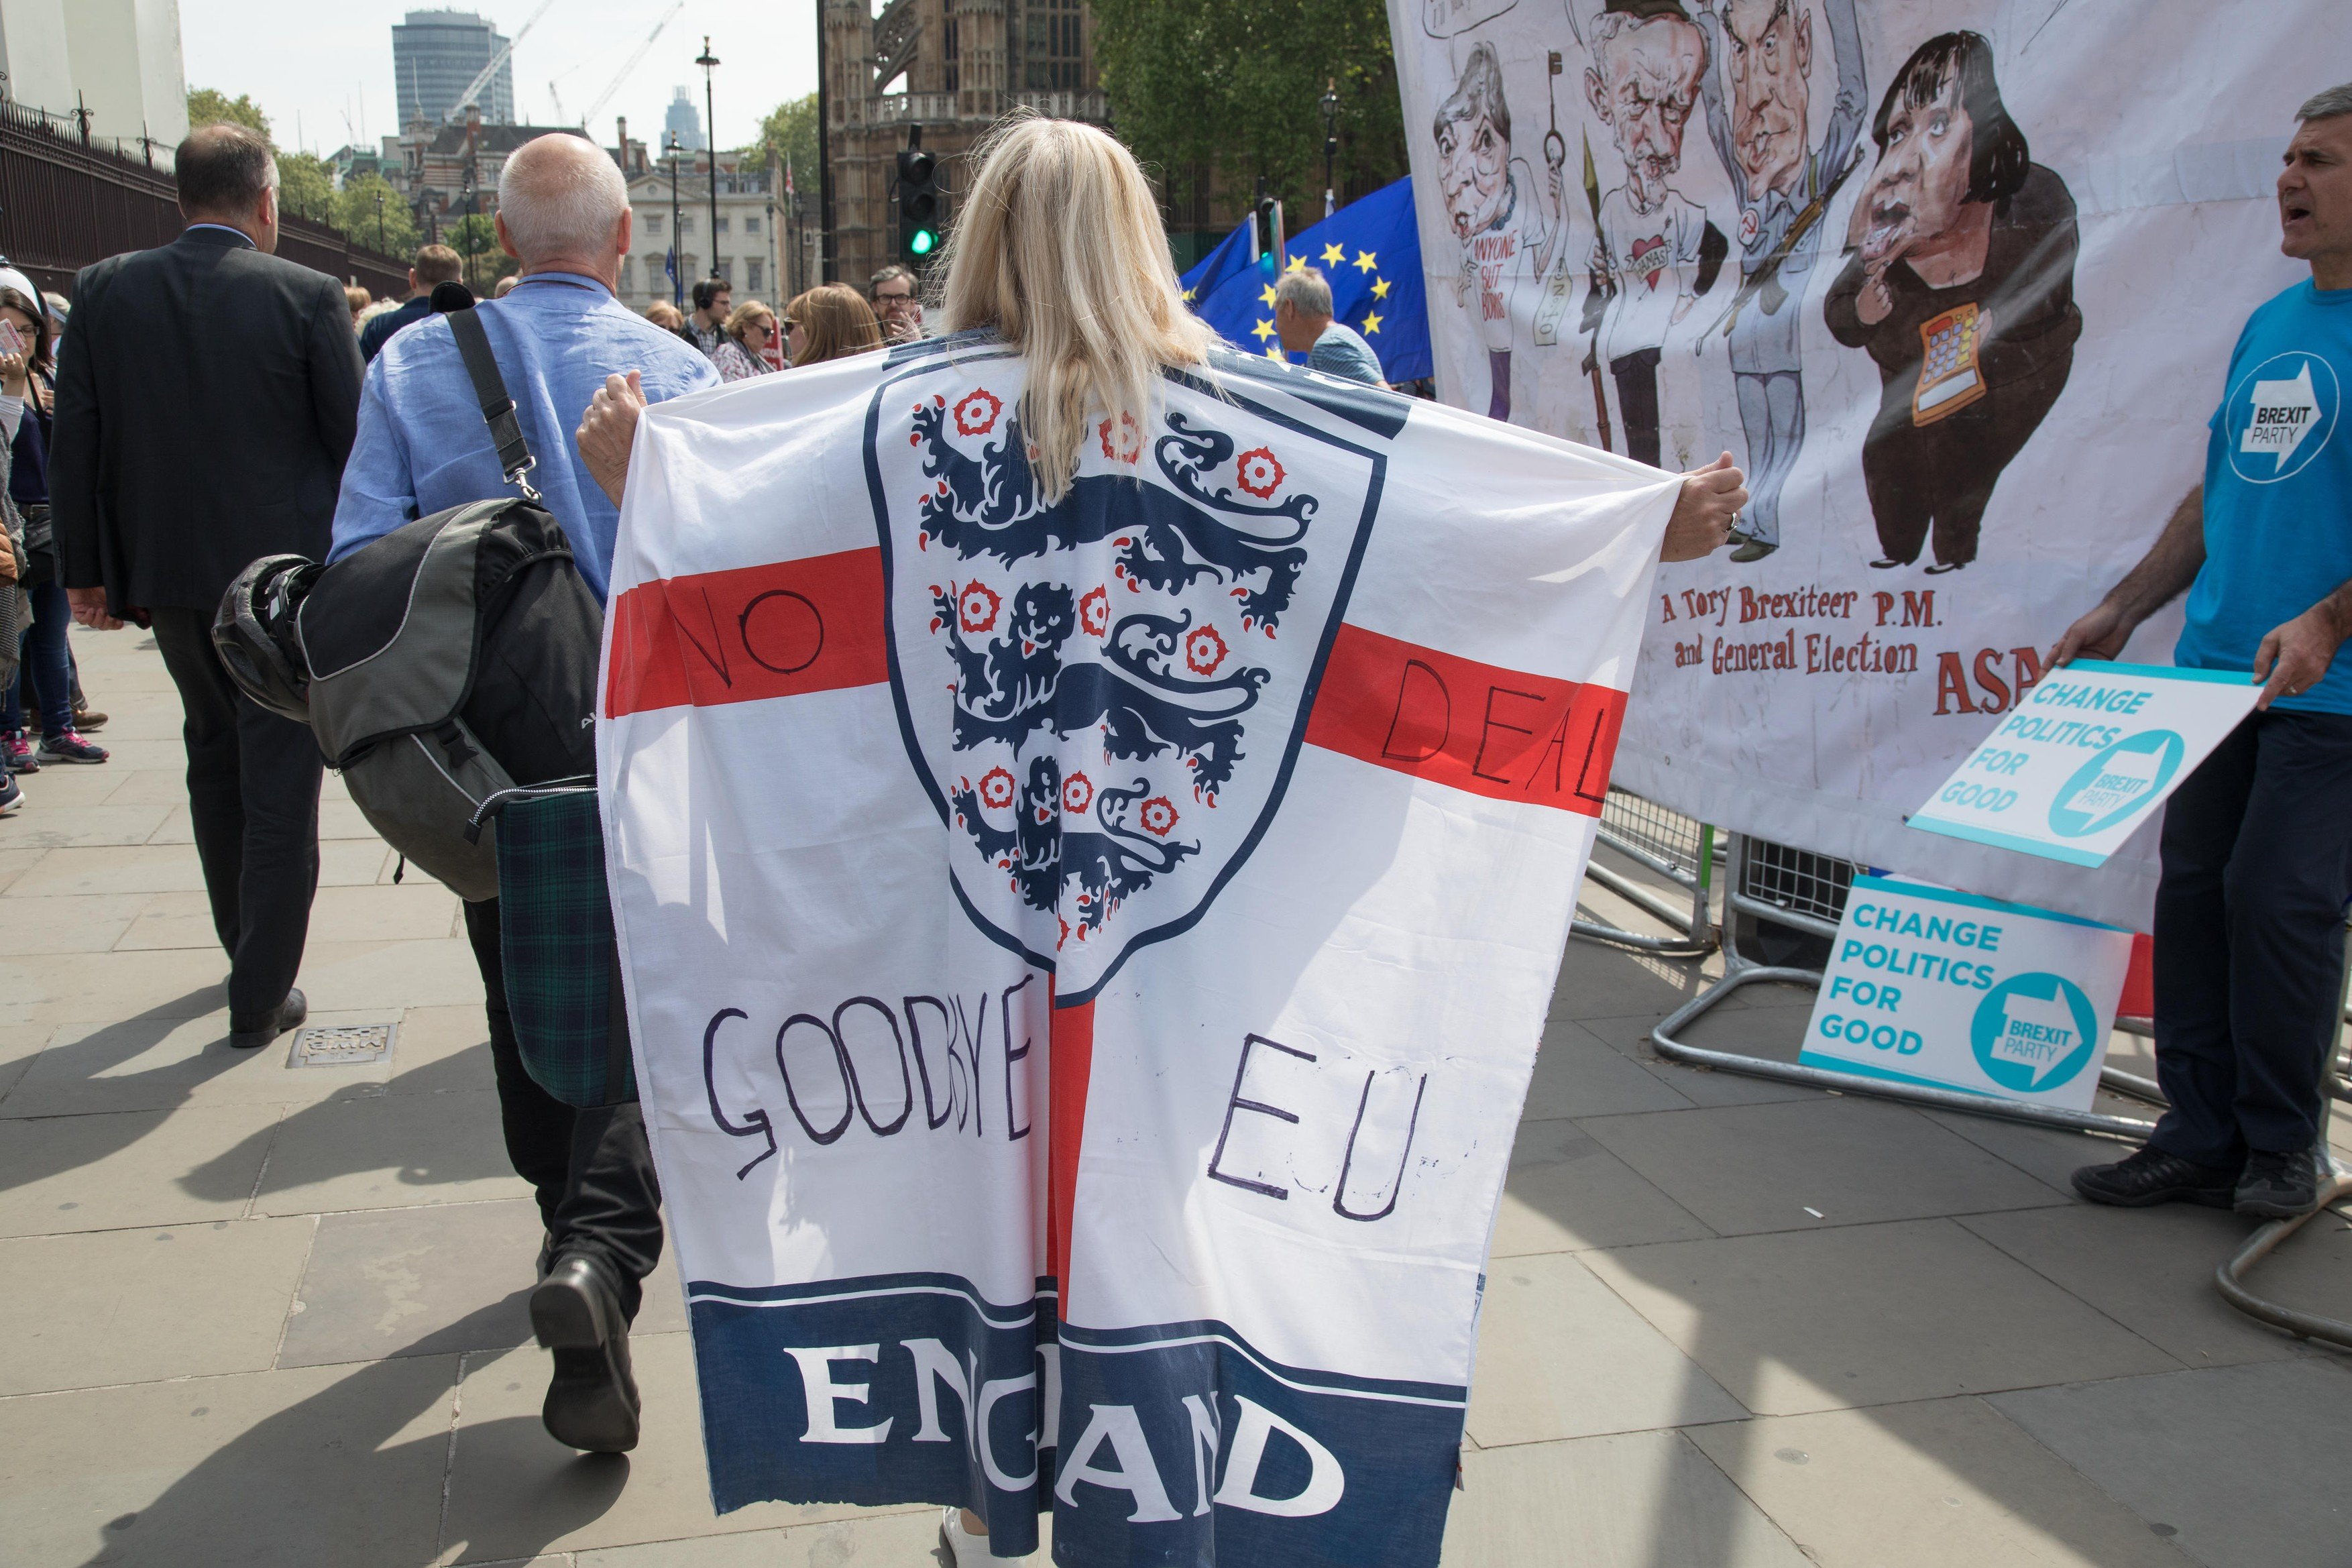 Stoupenci brexitu